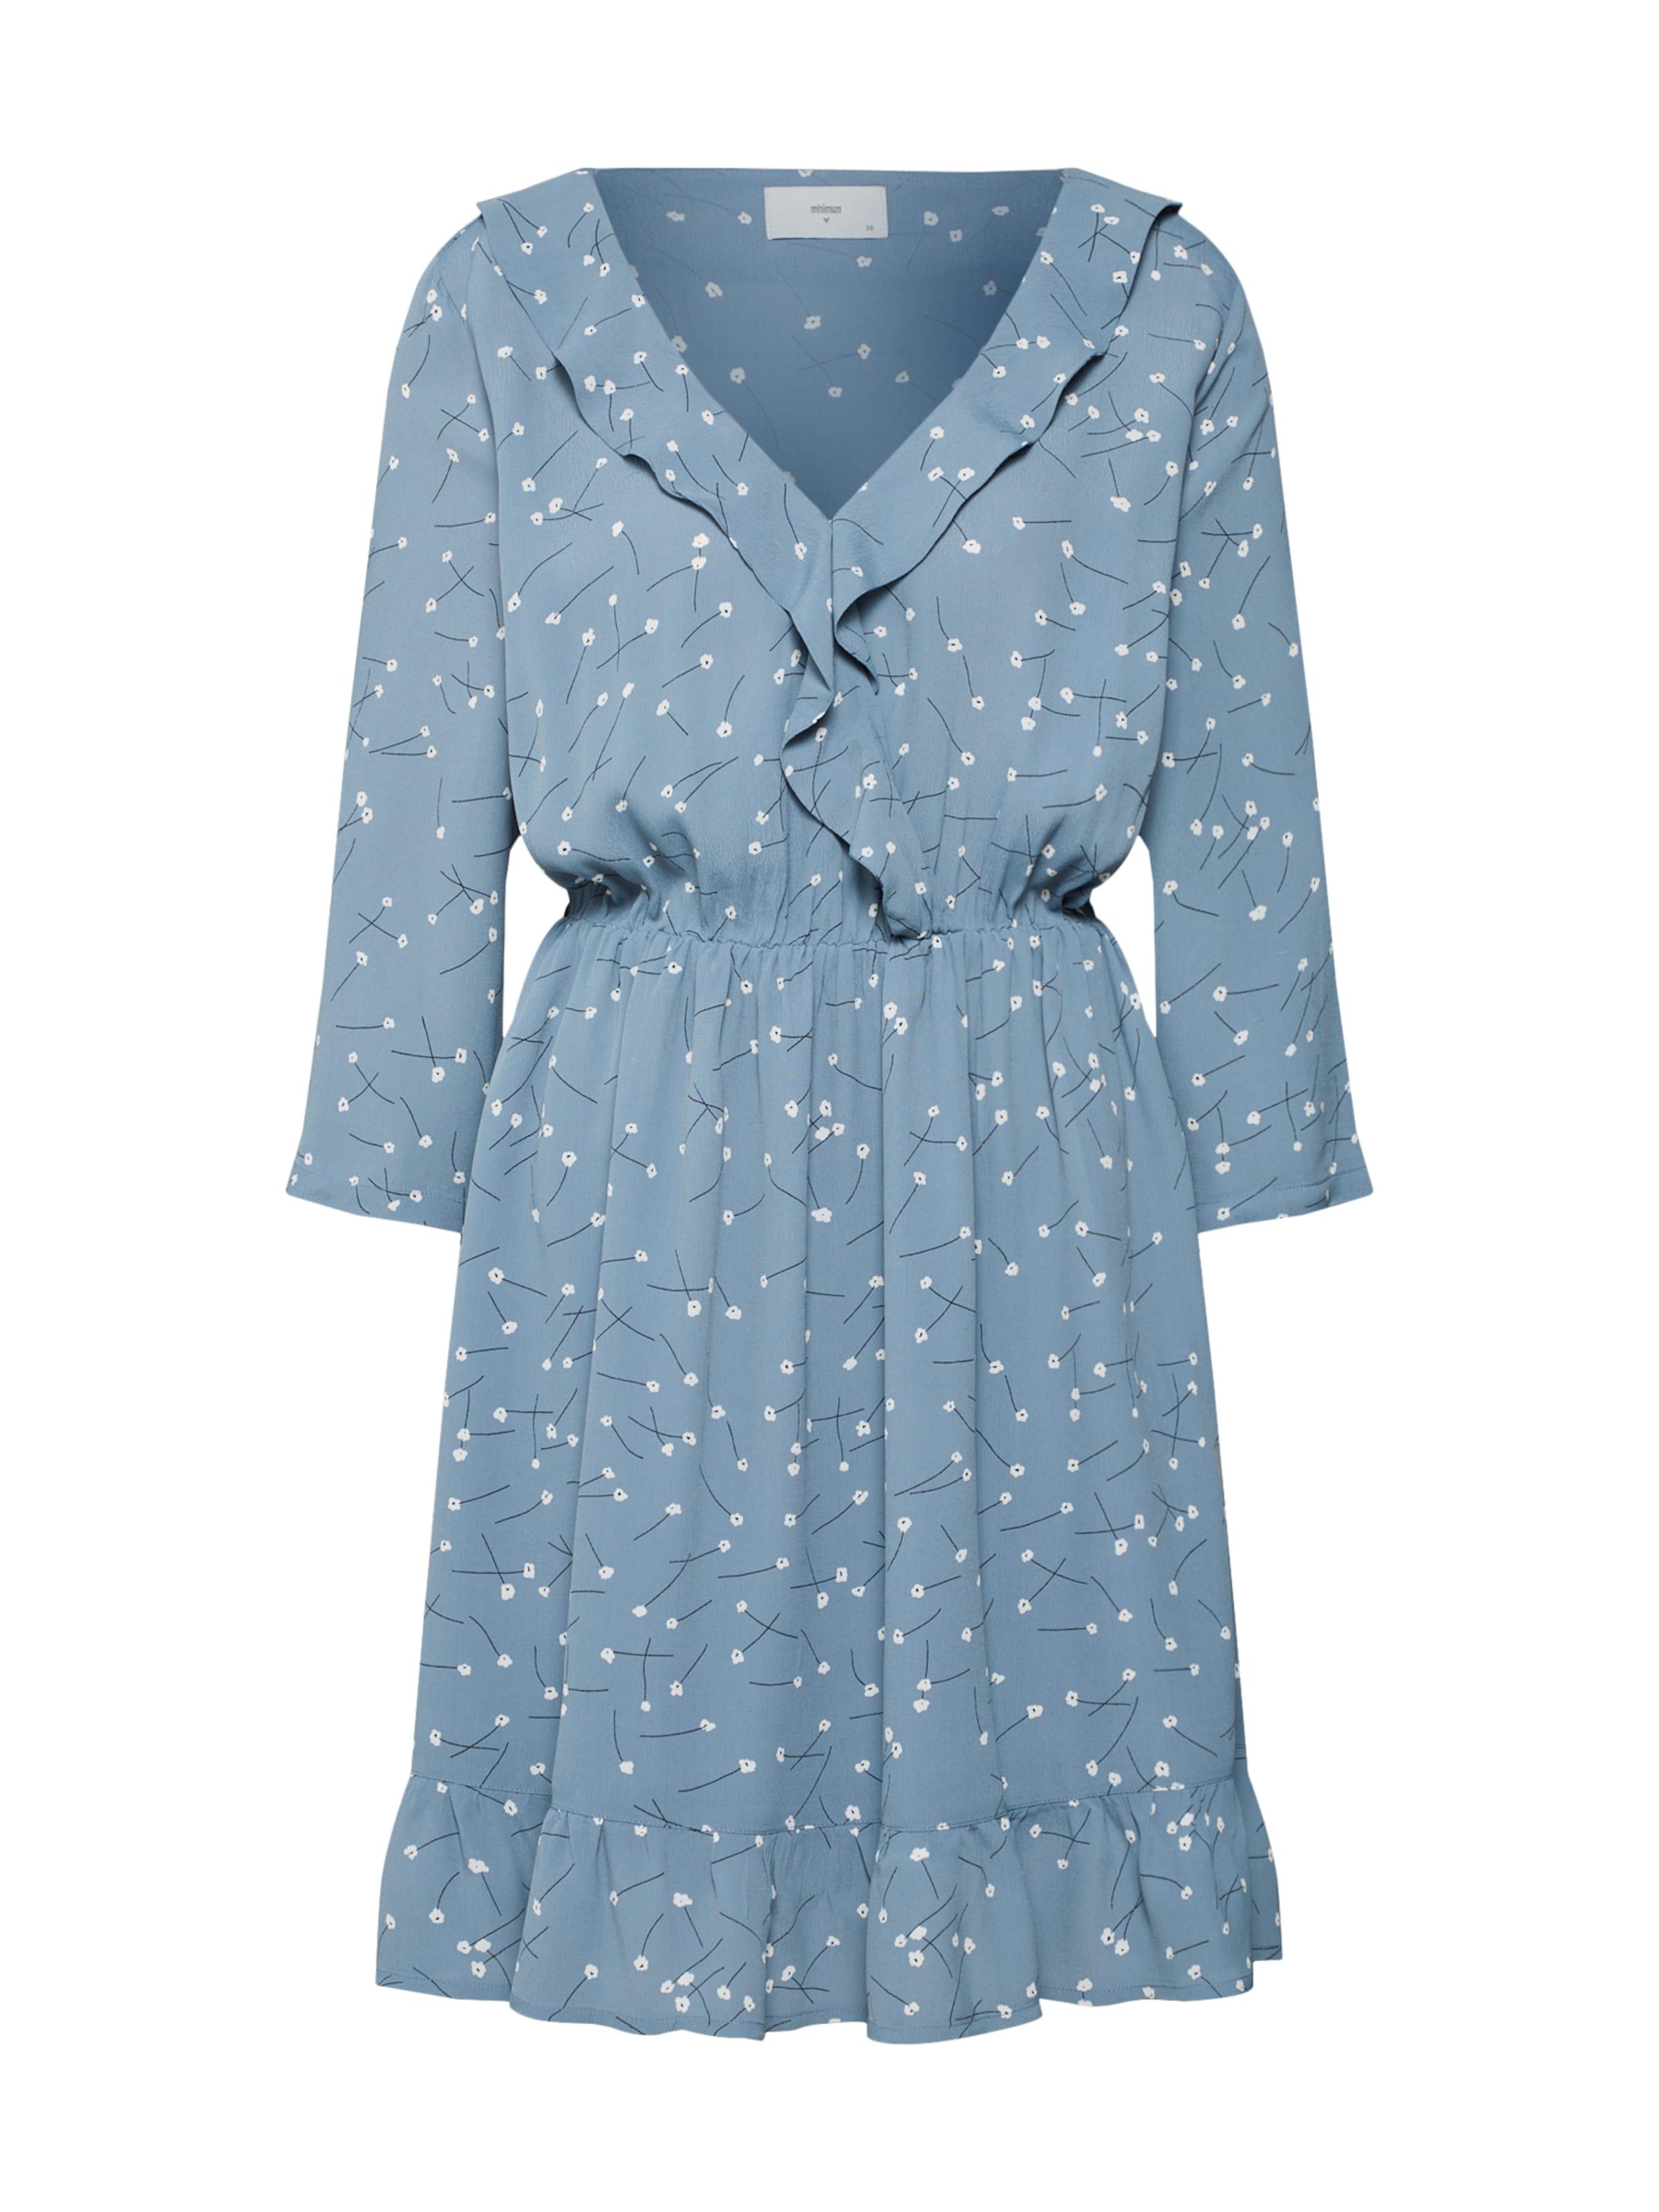 Minimum Kleid Minimum Kleid 'barbel' In Hellblau Minimum Kleid 'barbel' Hellblau In uPkOZXi